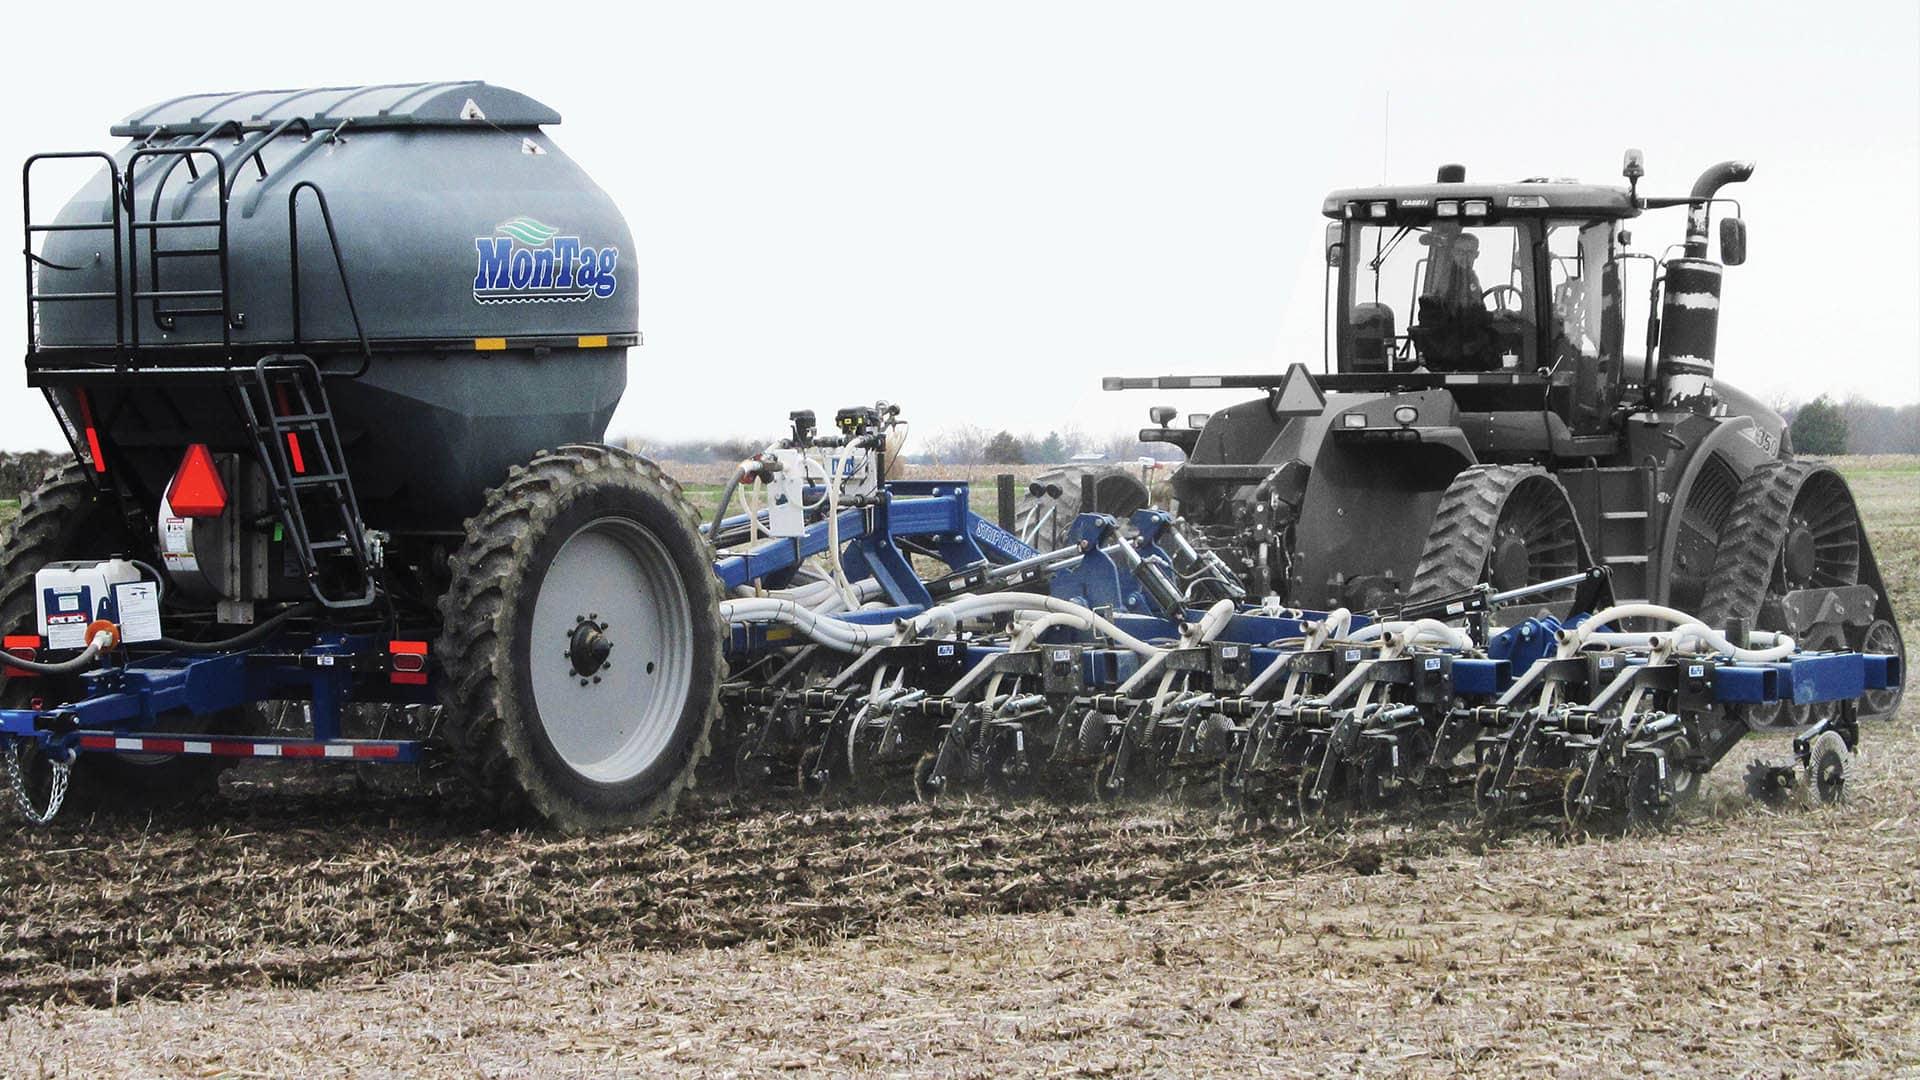 Обработчик почвы/грунта Blu-Jet STRIPTRACKER - Купить каток для культиватора